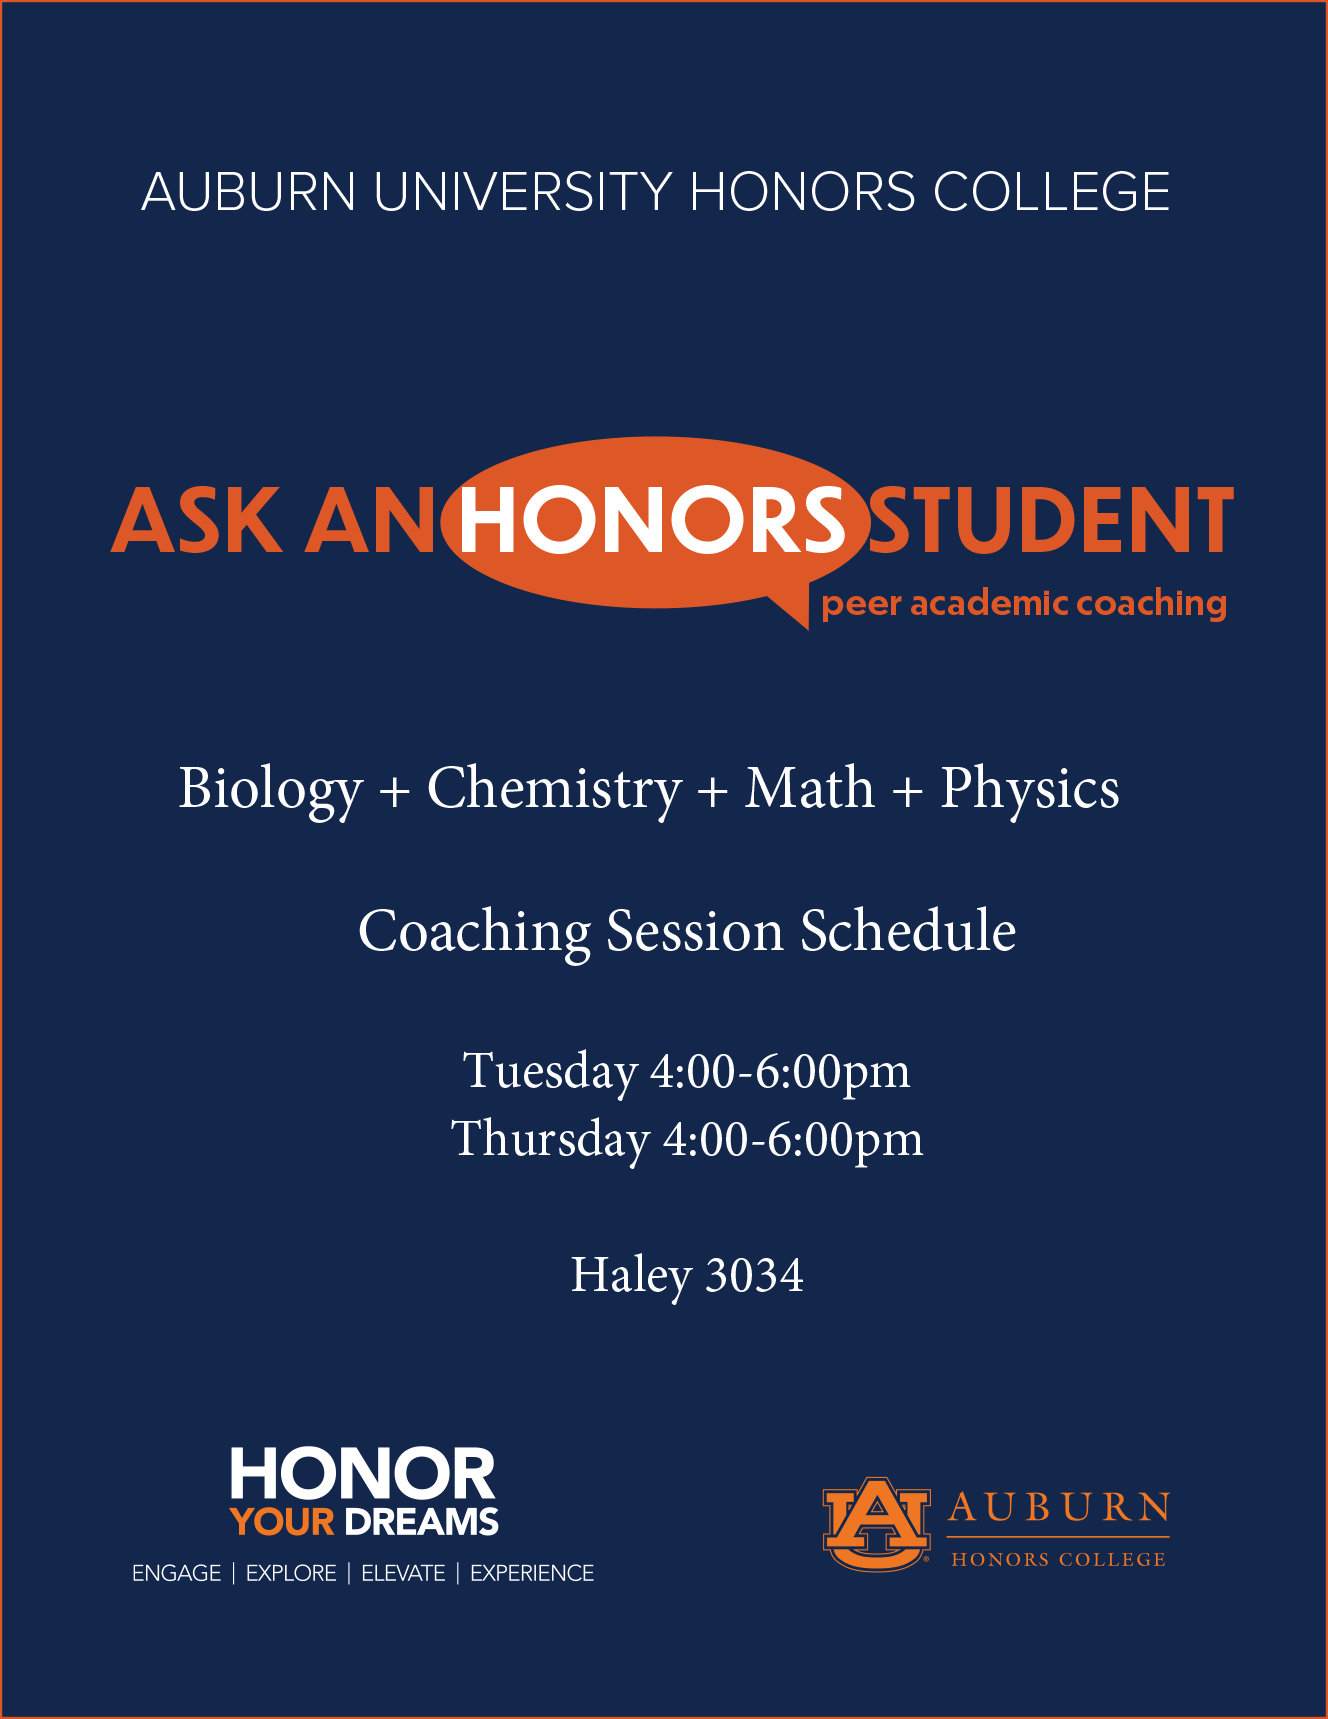 Peer Academic Coaching | Honors College